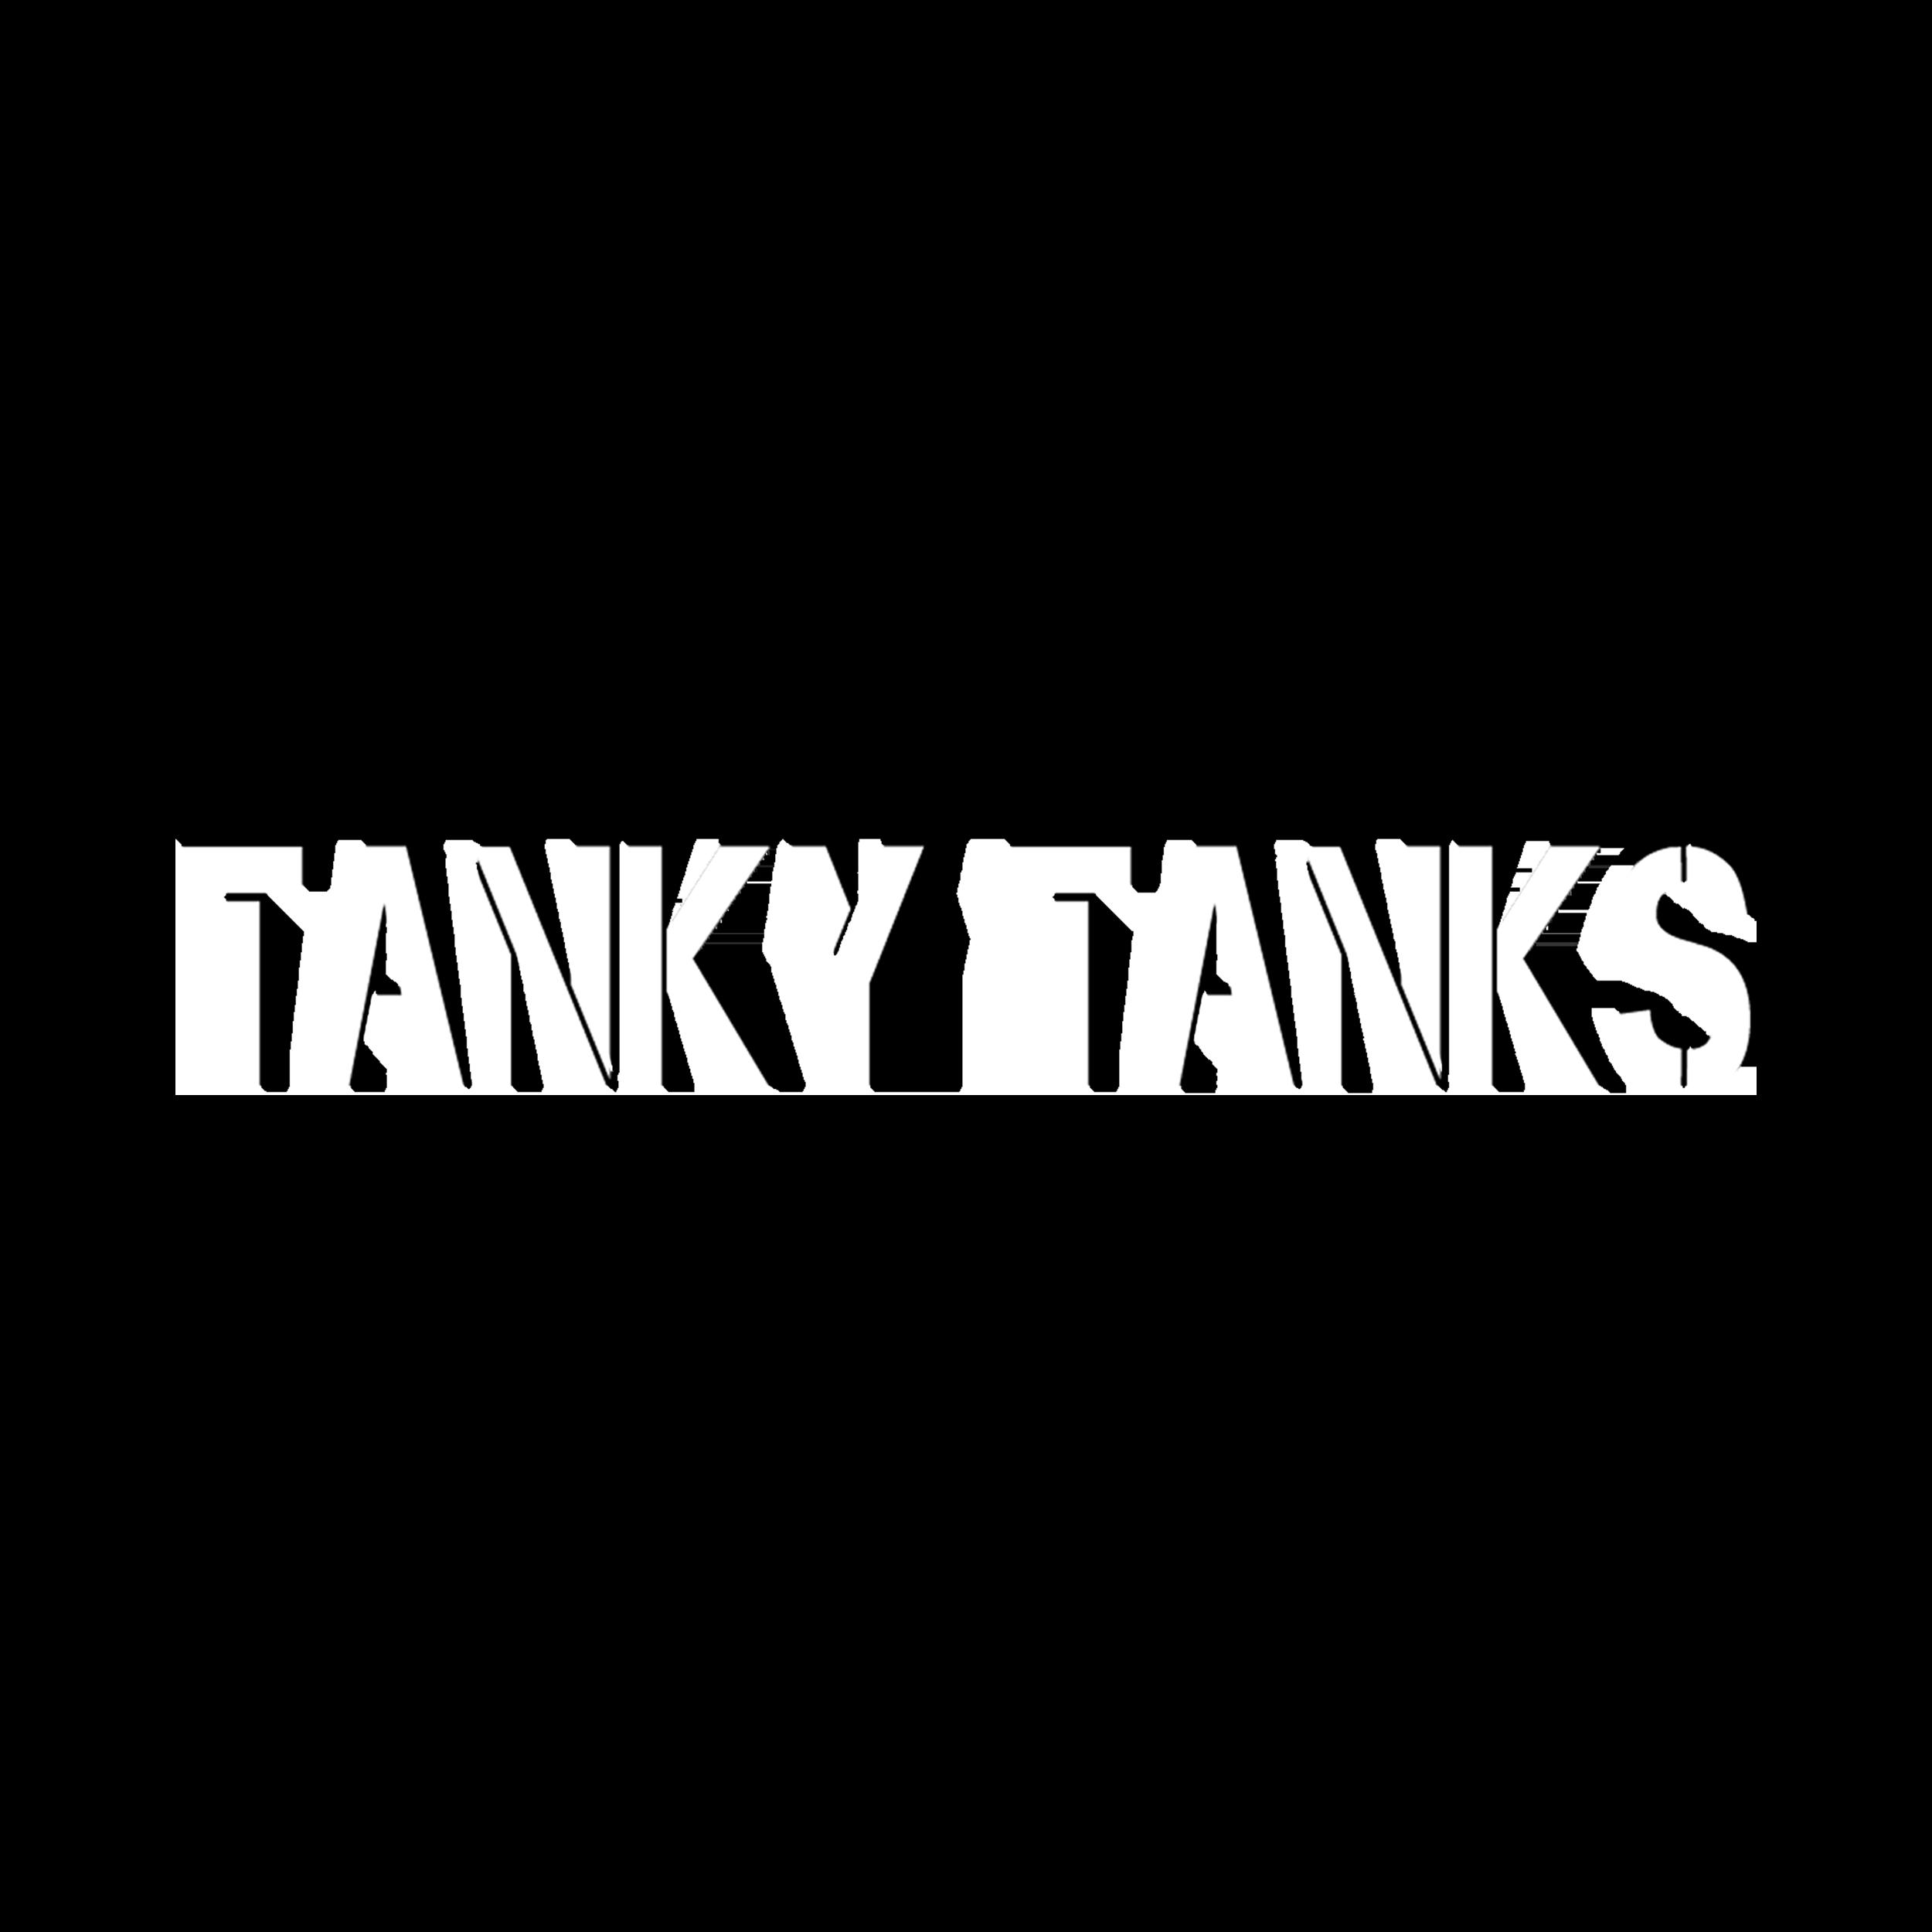 Tanky Tanks logo